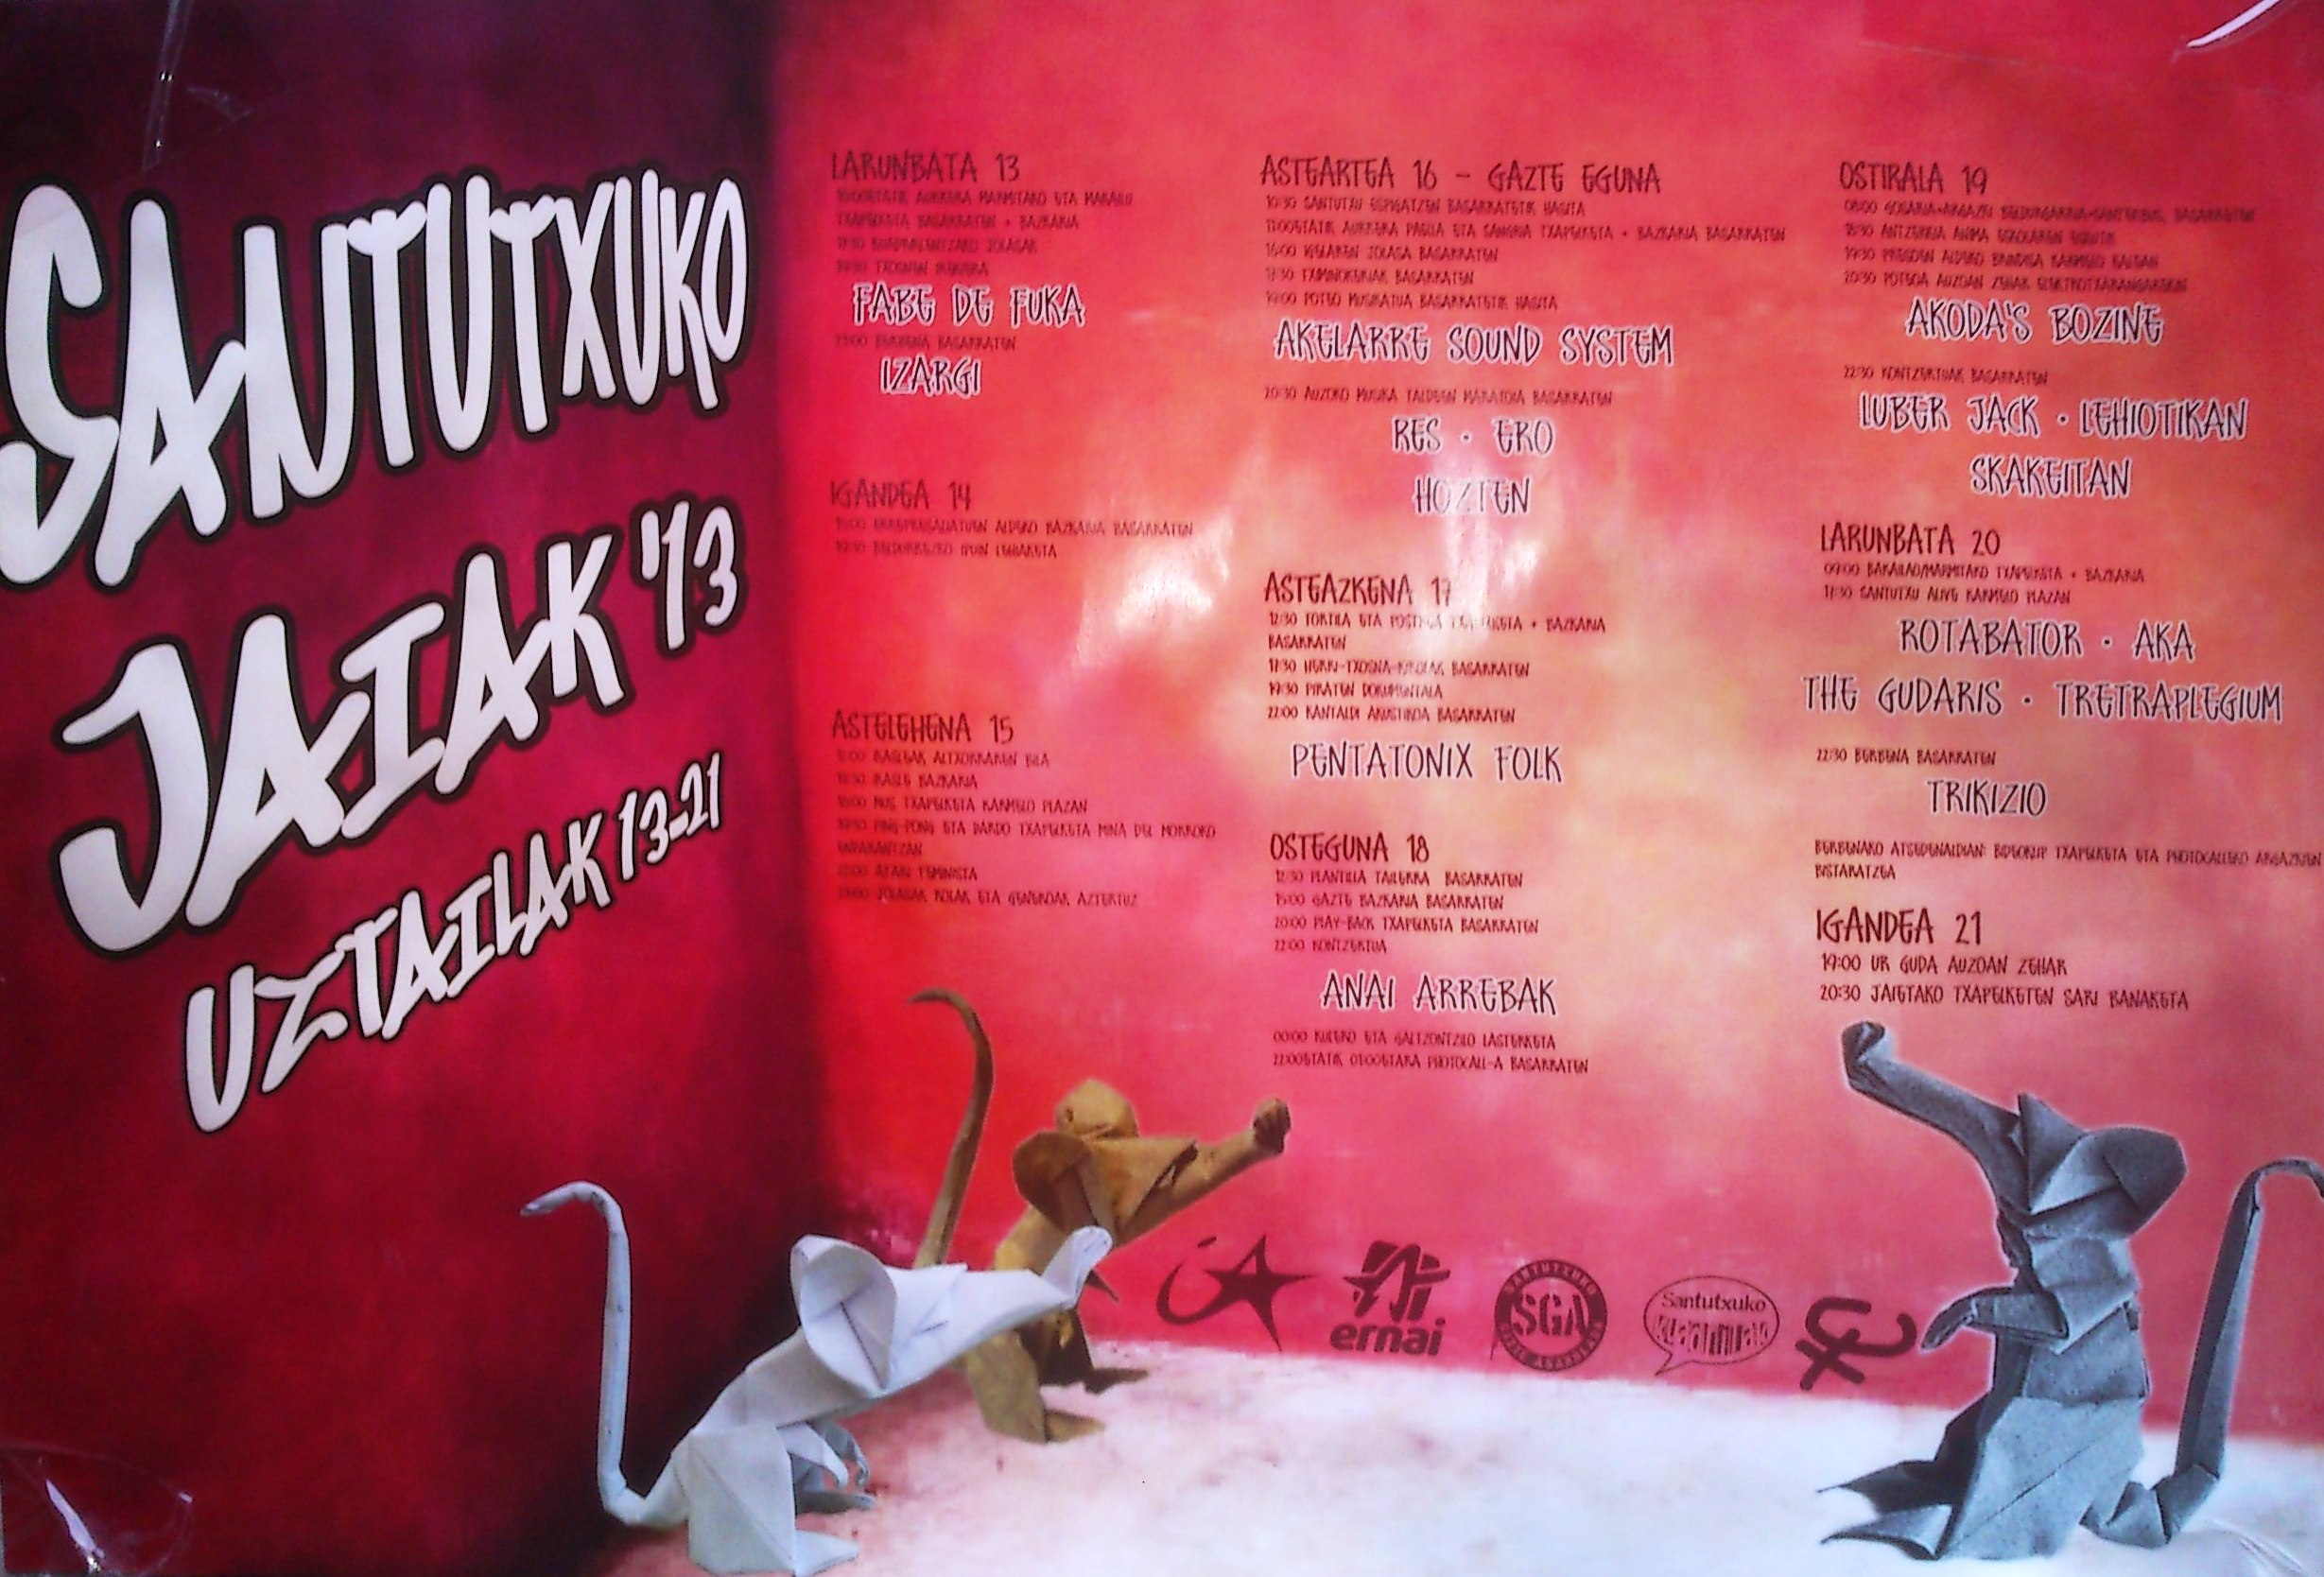 Santutxuko jaiak 2013, programa completo